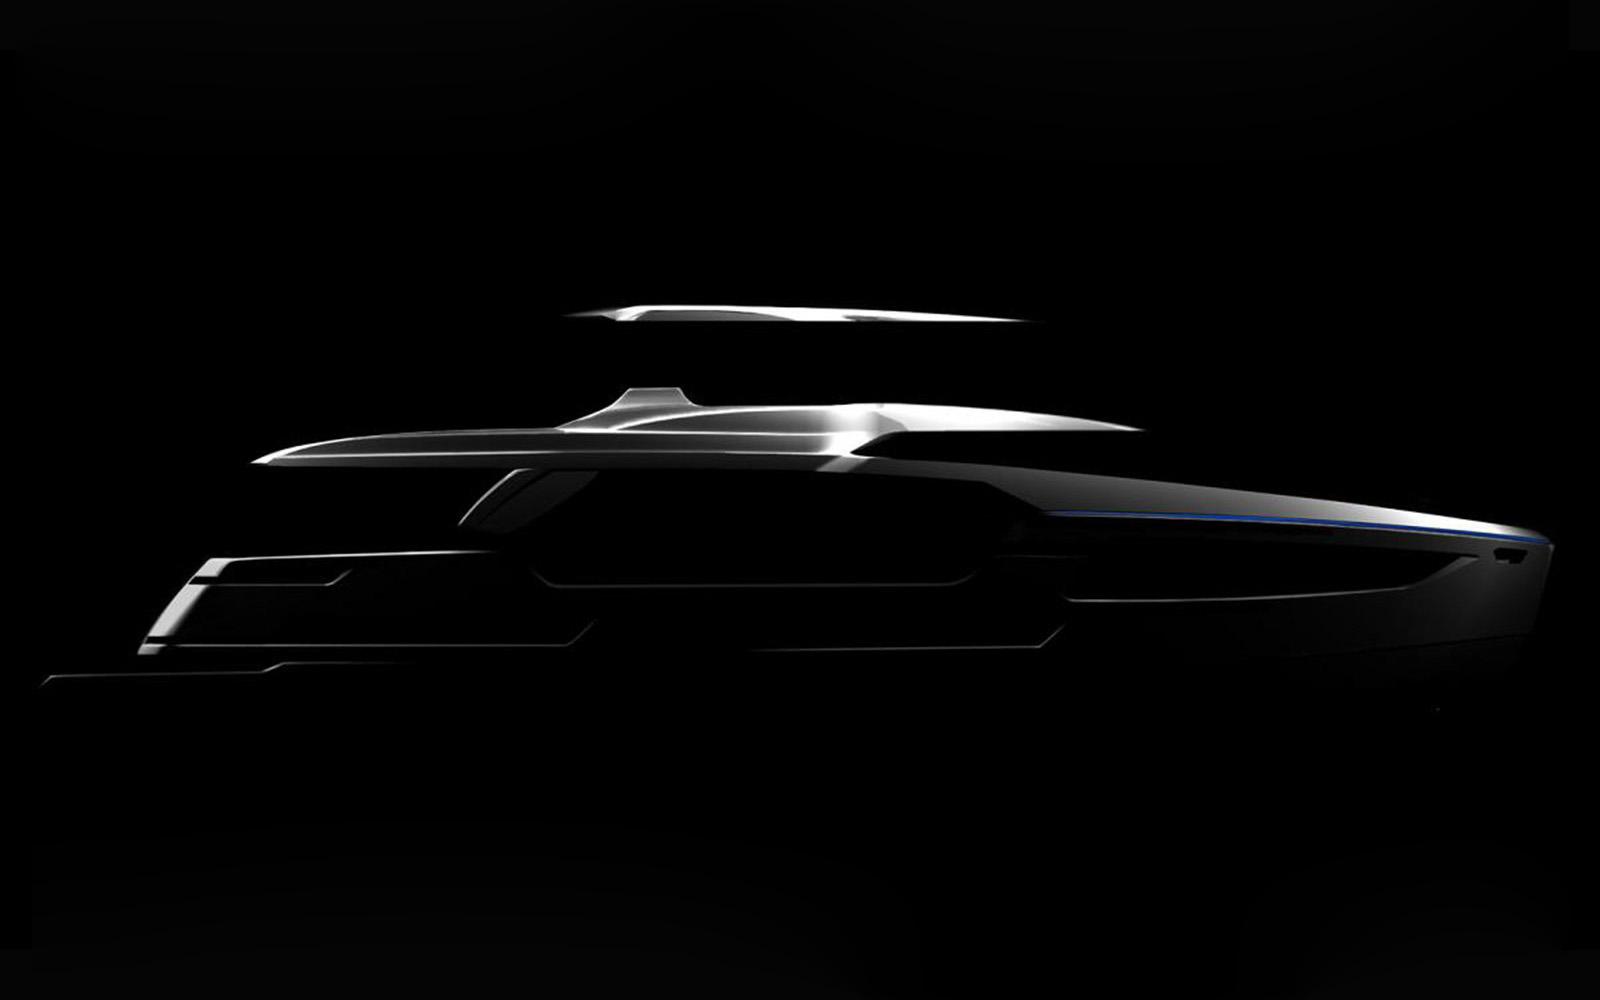 horizon yachts superiate fd70 - boat shopping